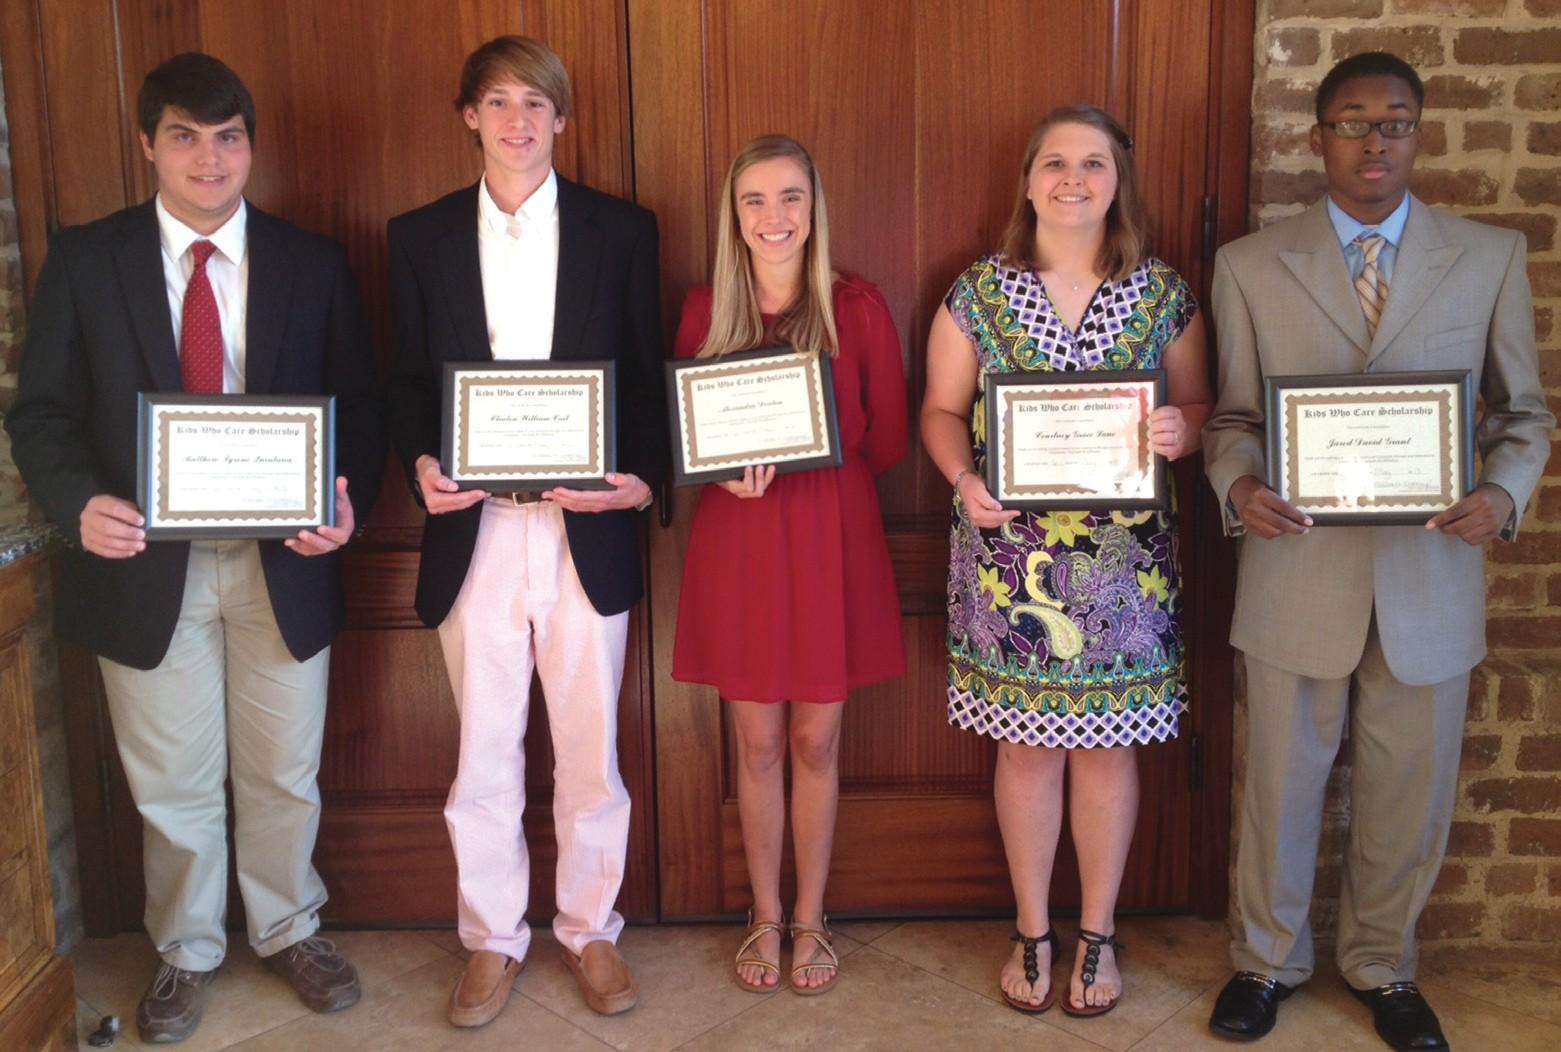 2013 Junior League of Savannah Kids Who Care Scholarship Recipients (L to R): Matthew Quintana, Clinton Cail, Alexandra Deaton, Courtney Lane, Jared Grant.